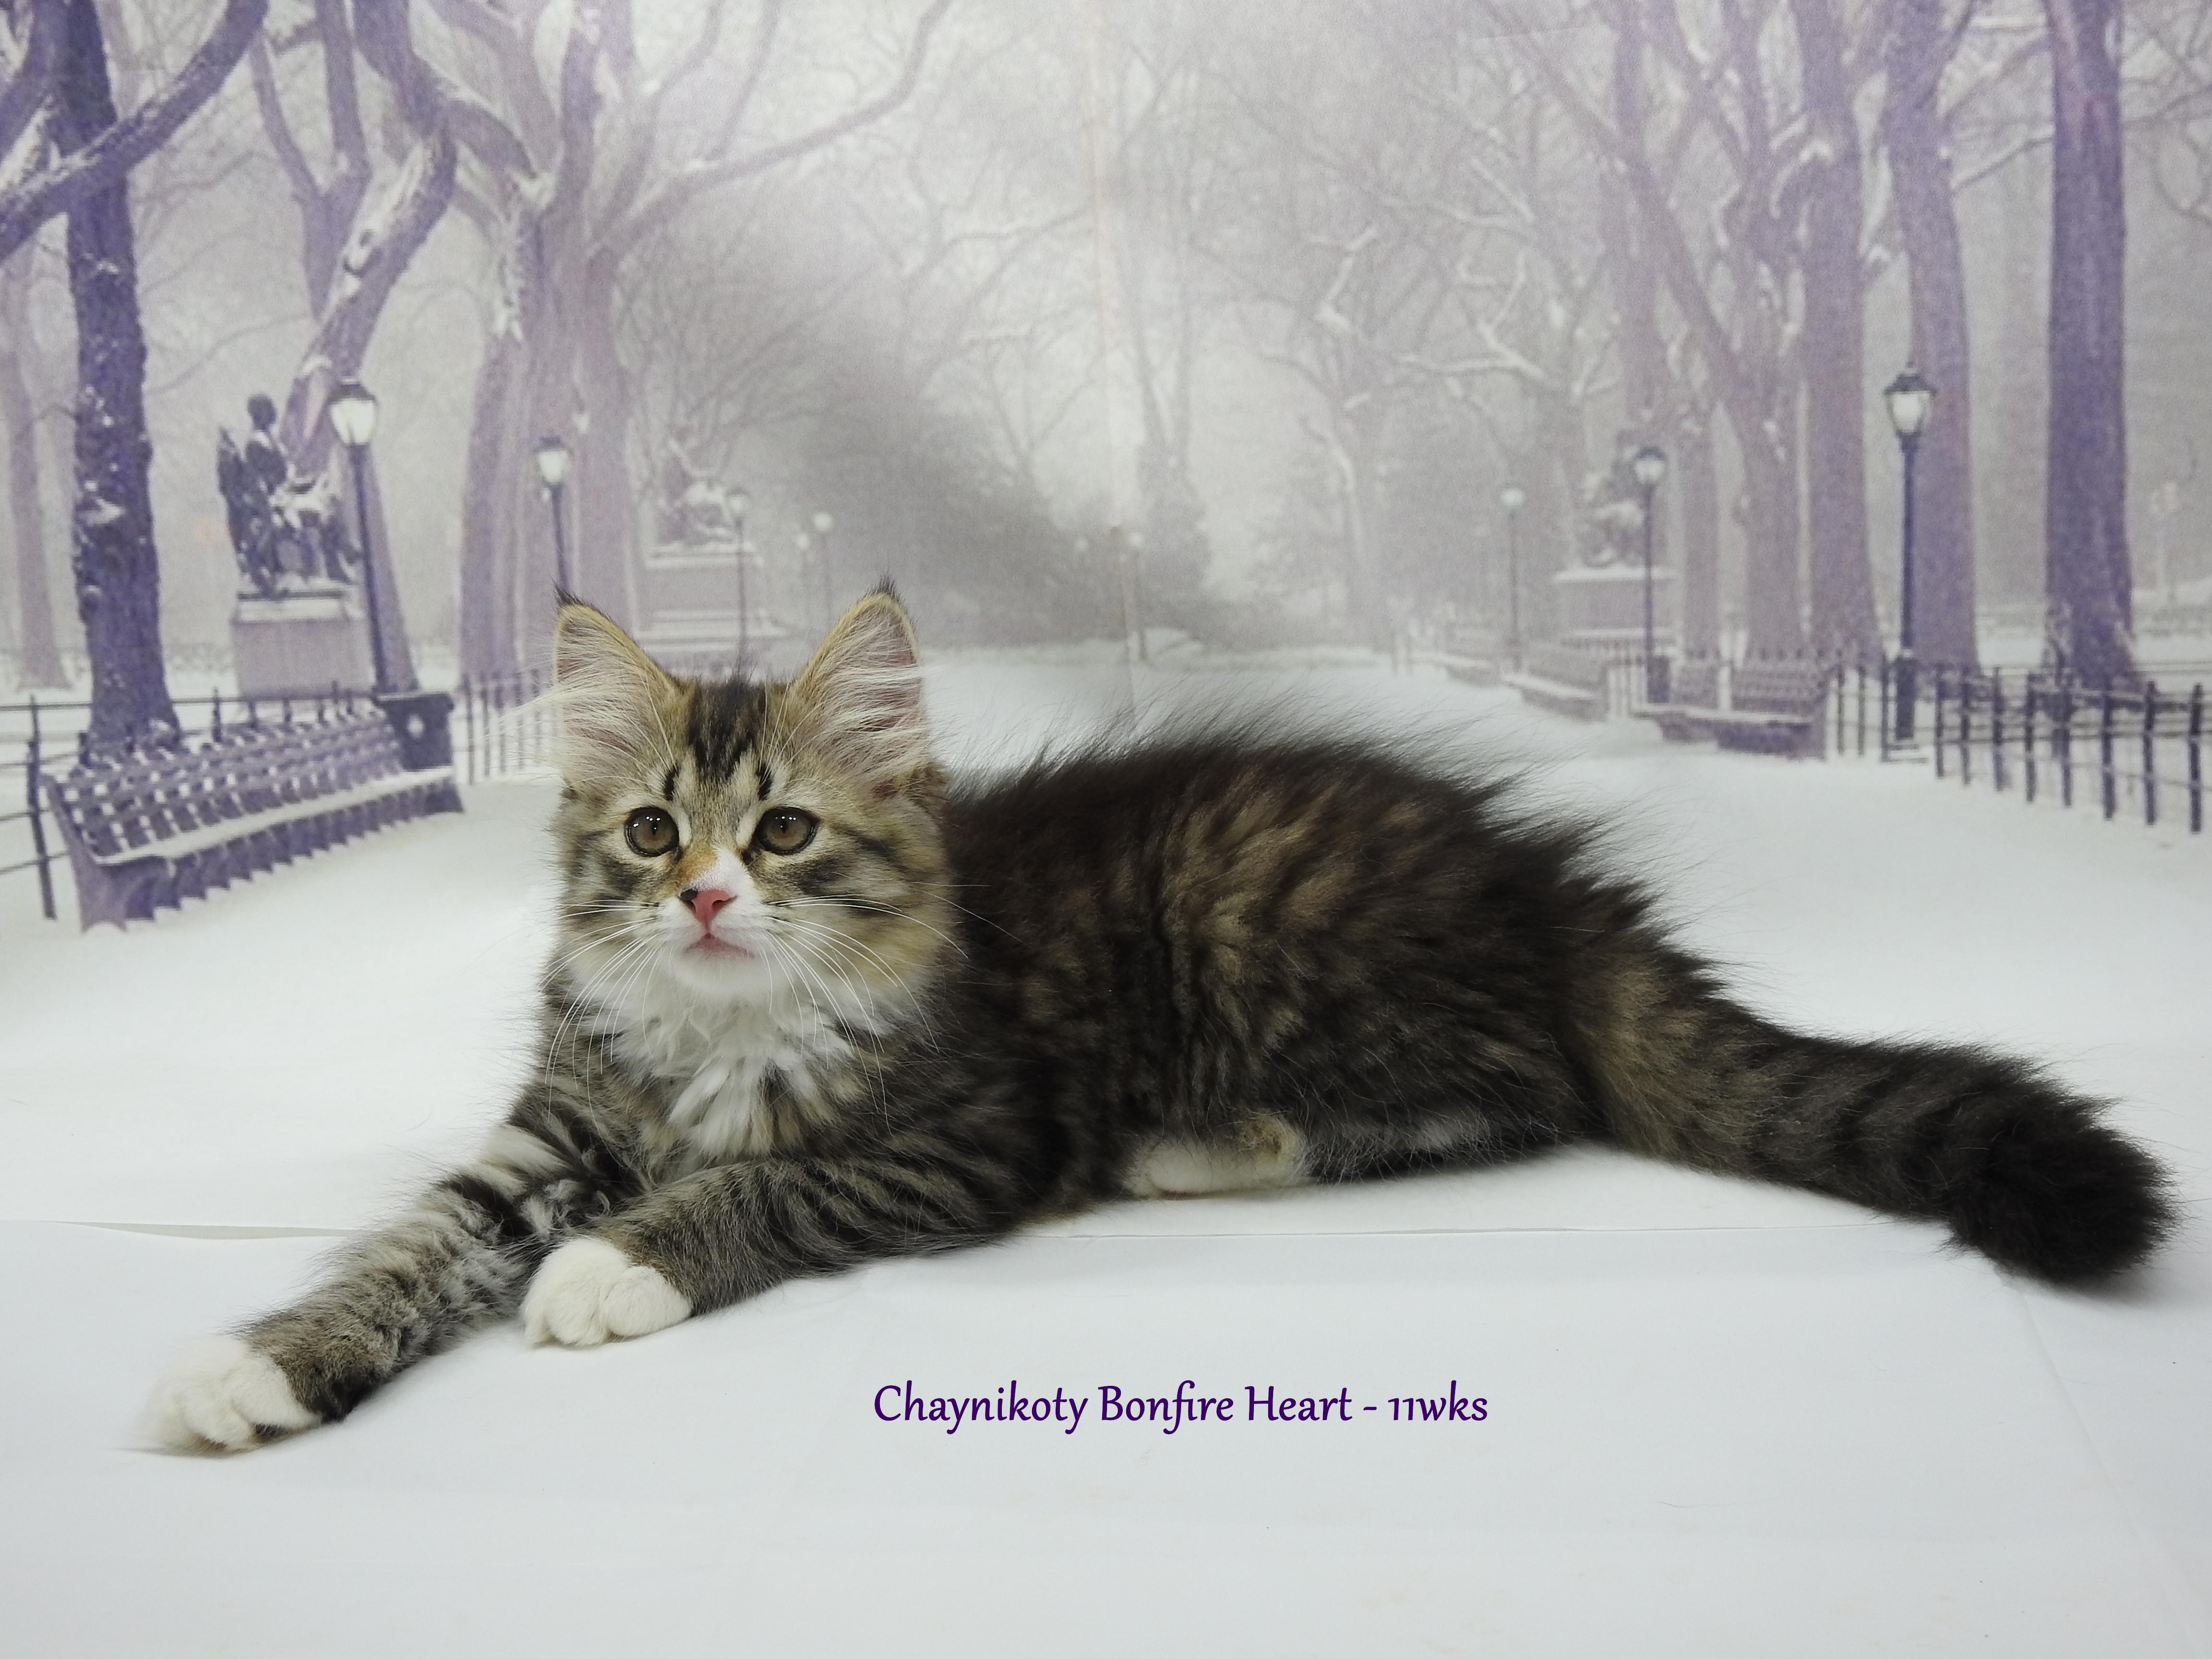 Chaynikoty Bonfire Heart - 11wks